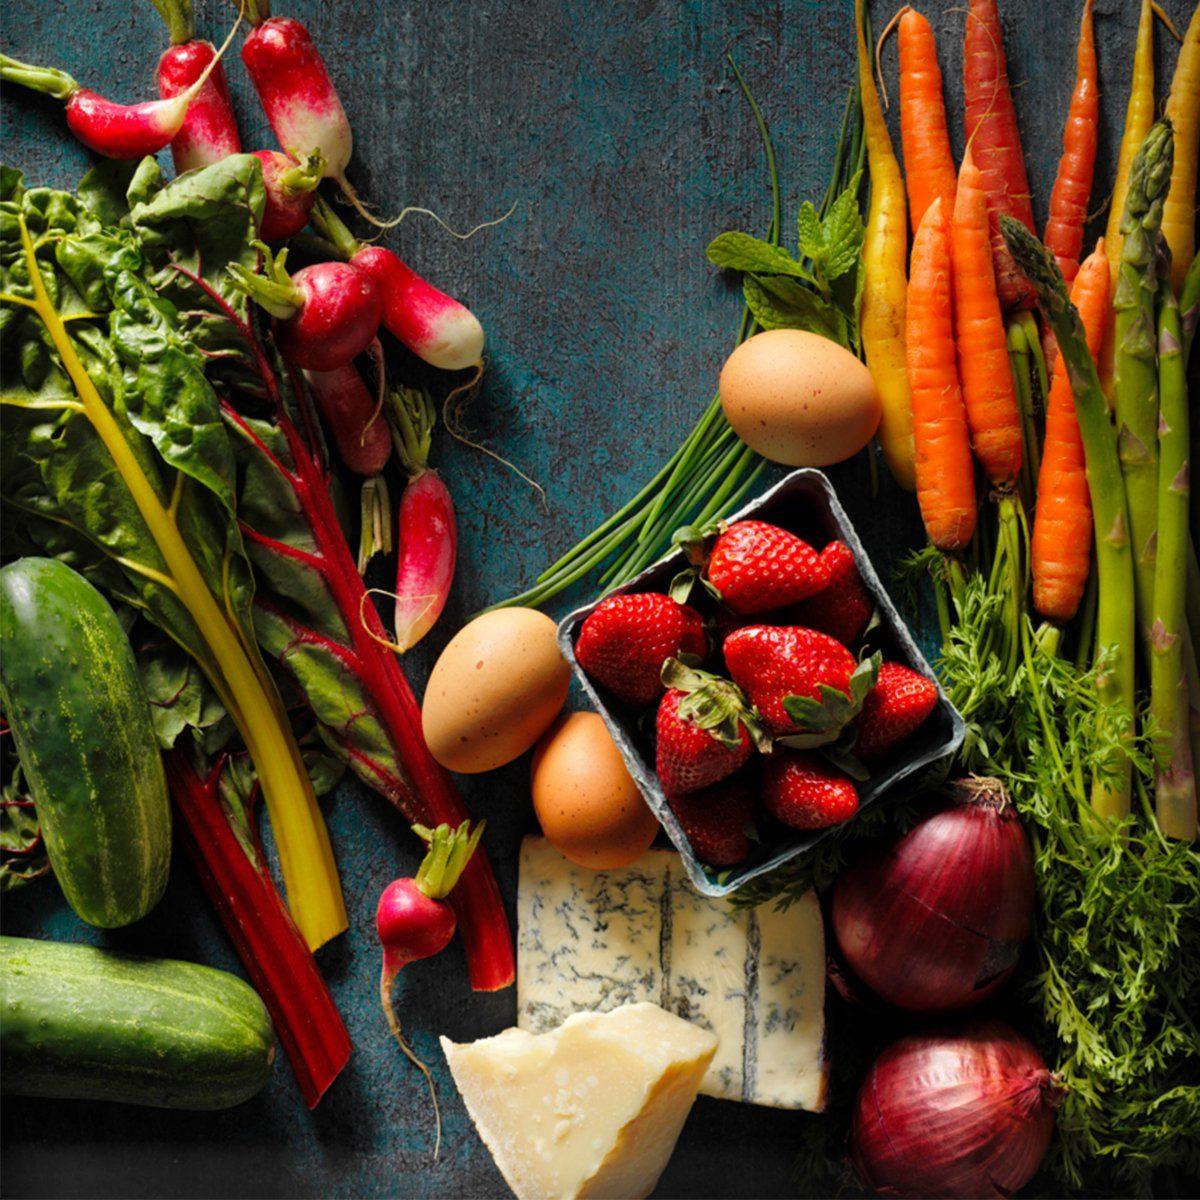 Farm to Table Cover via Taste of Home